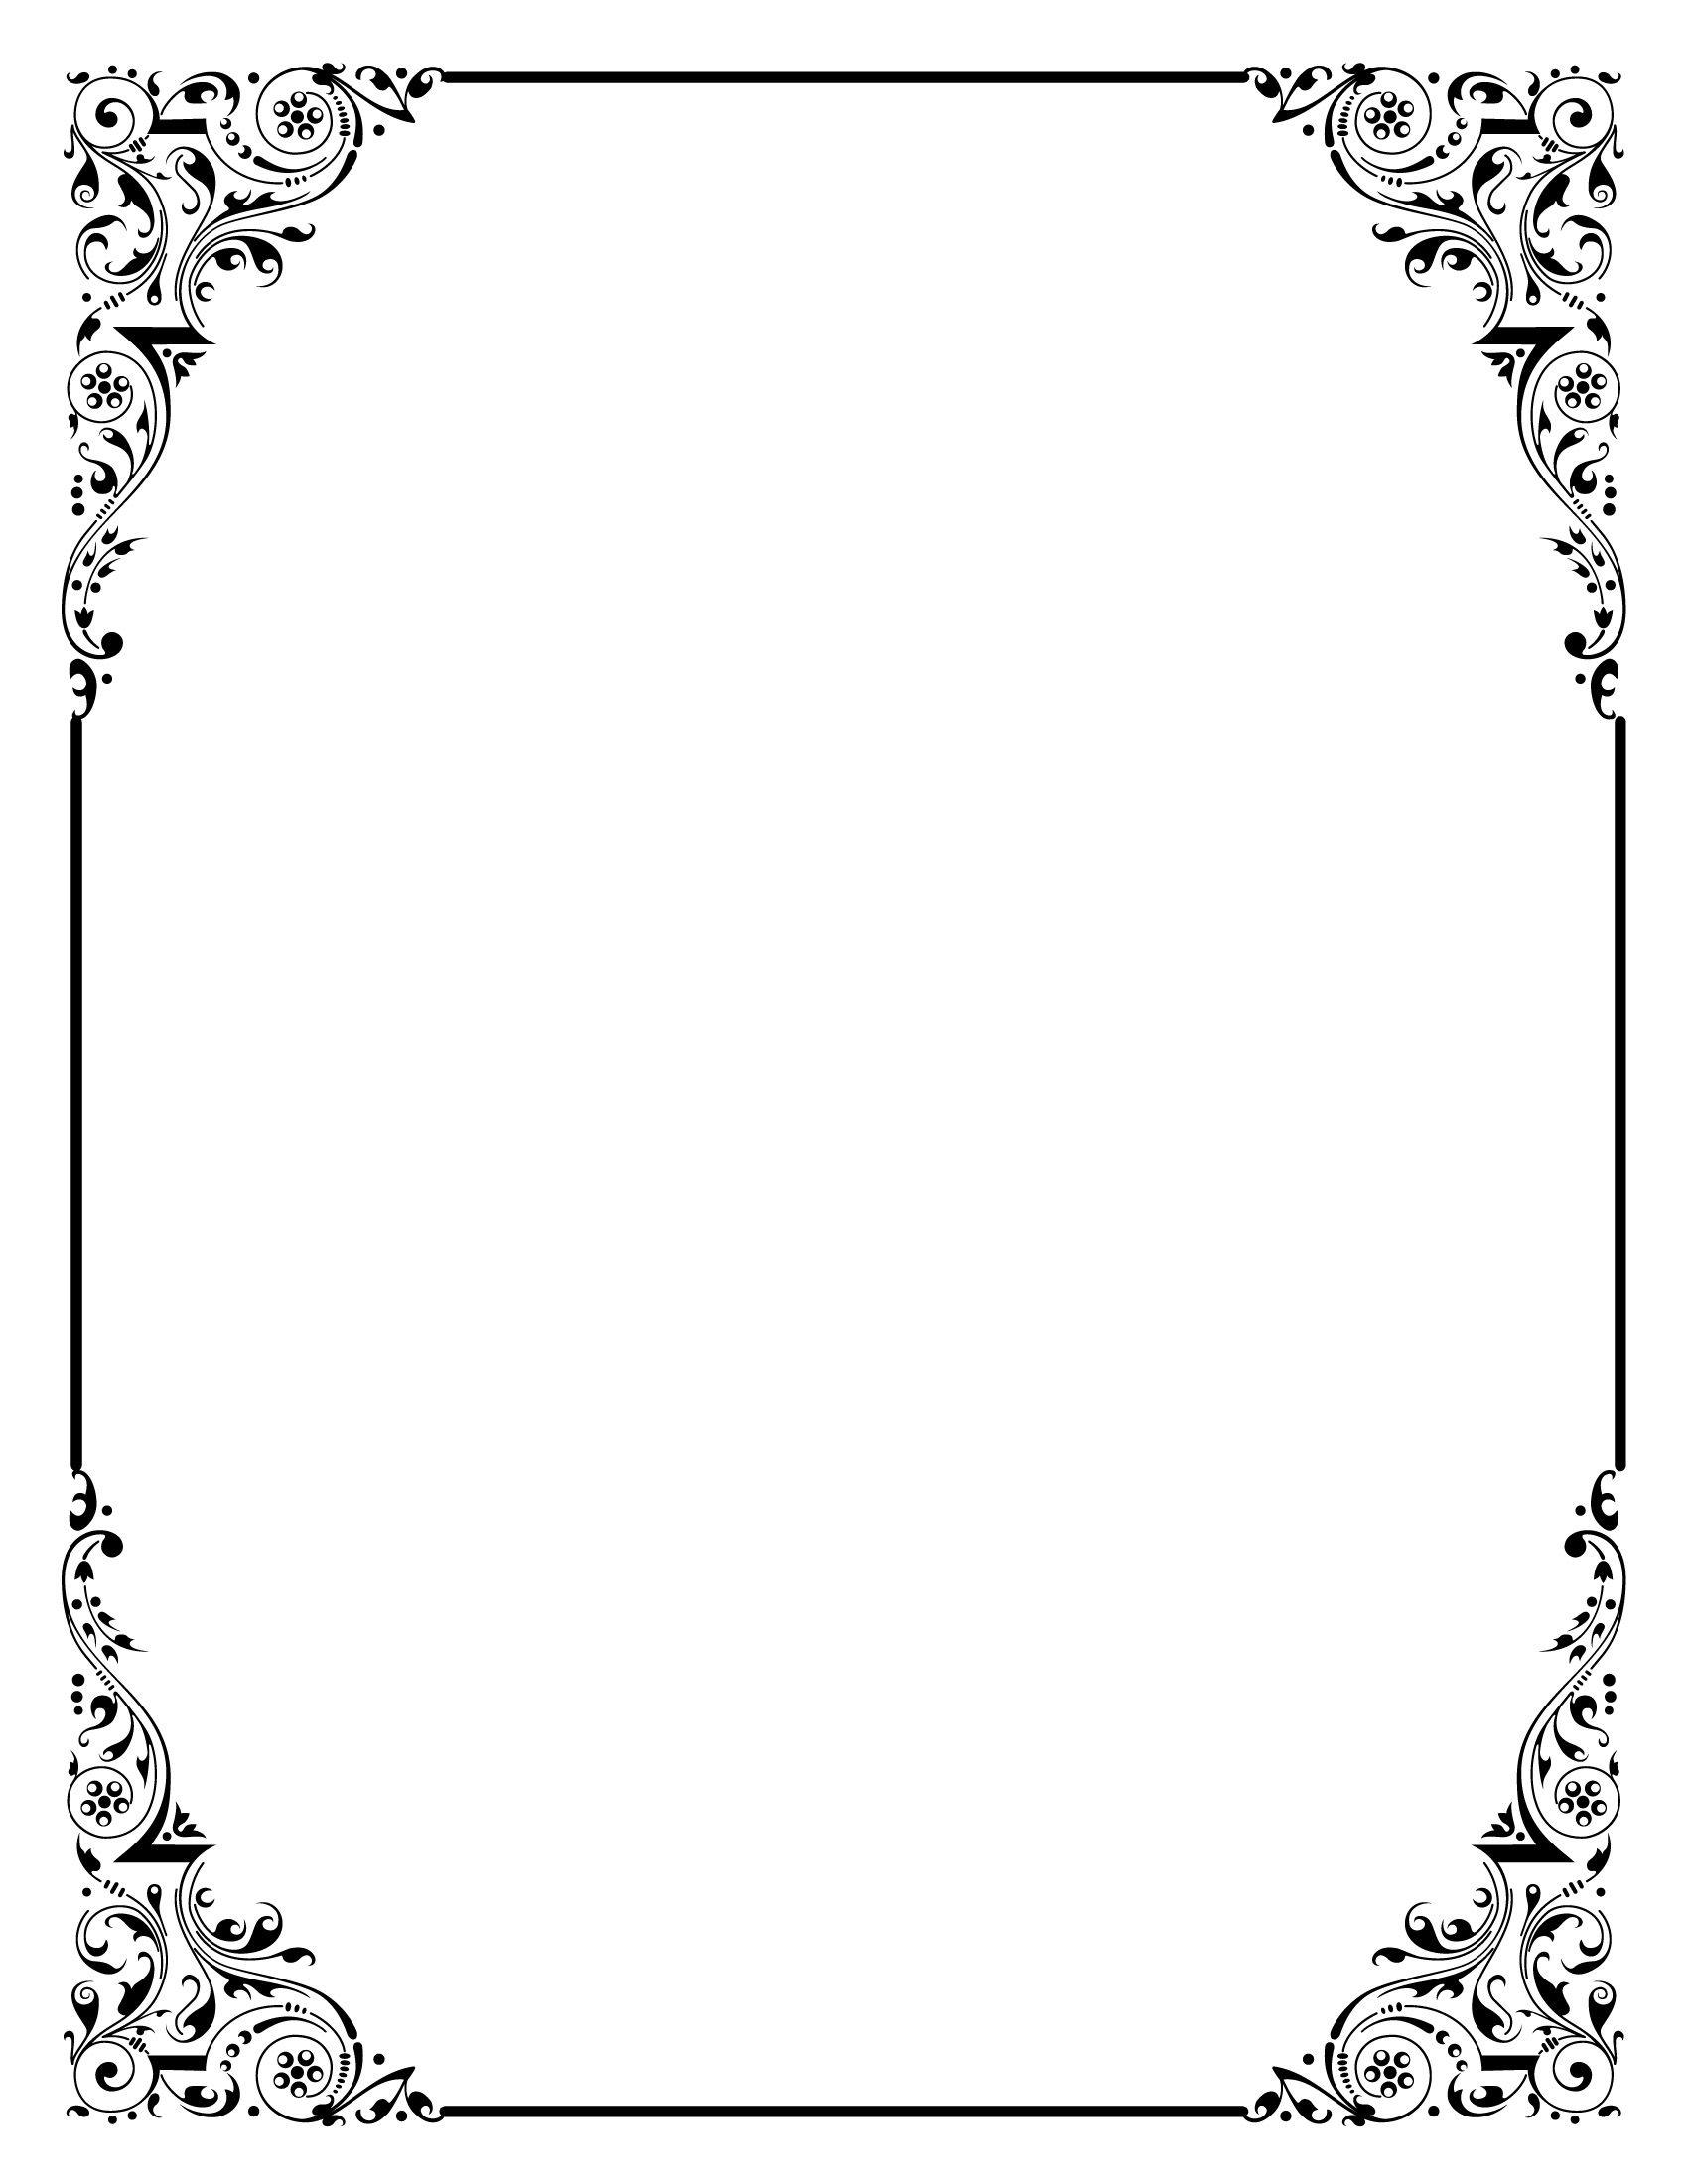 Imprimiveis pinterest fundos da flor flor e fundos vintage - Tea Party Cover Border Google Search Flower